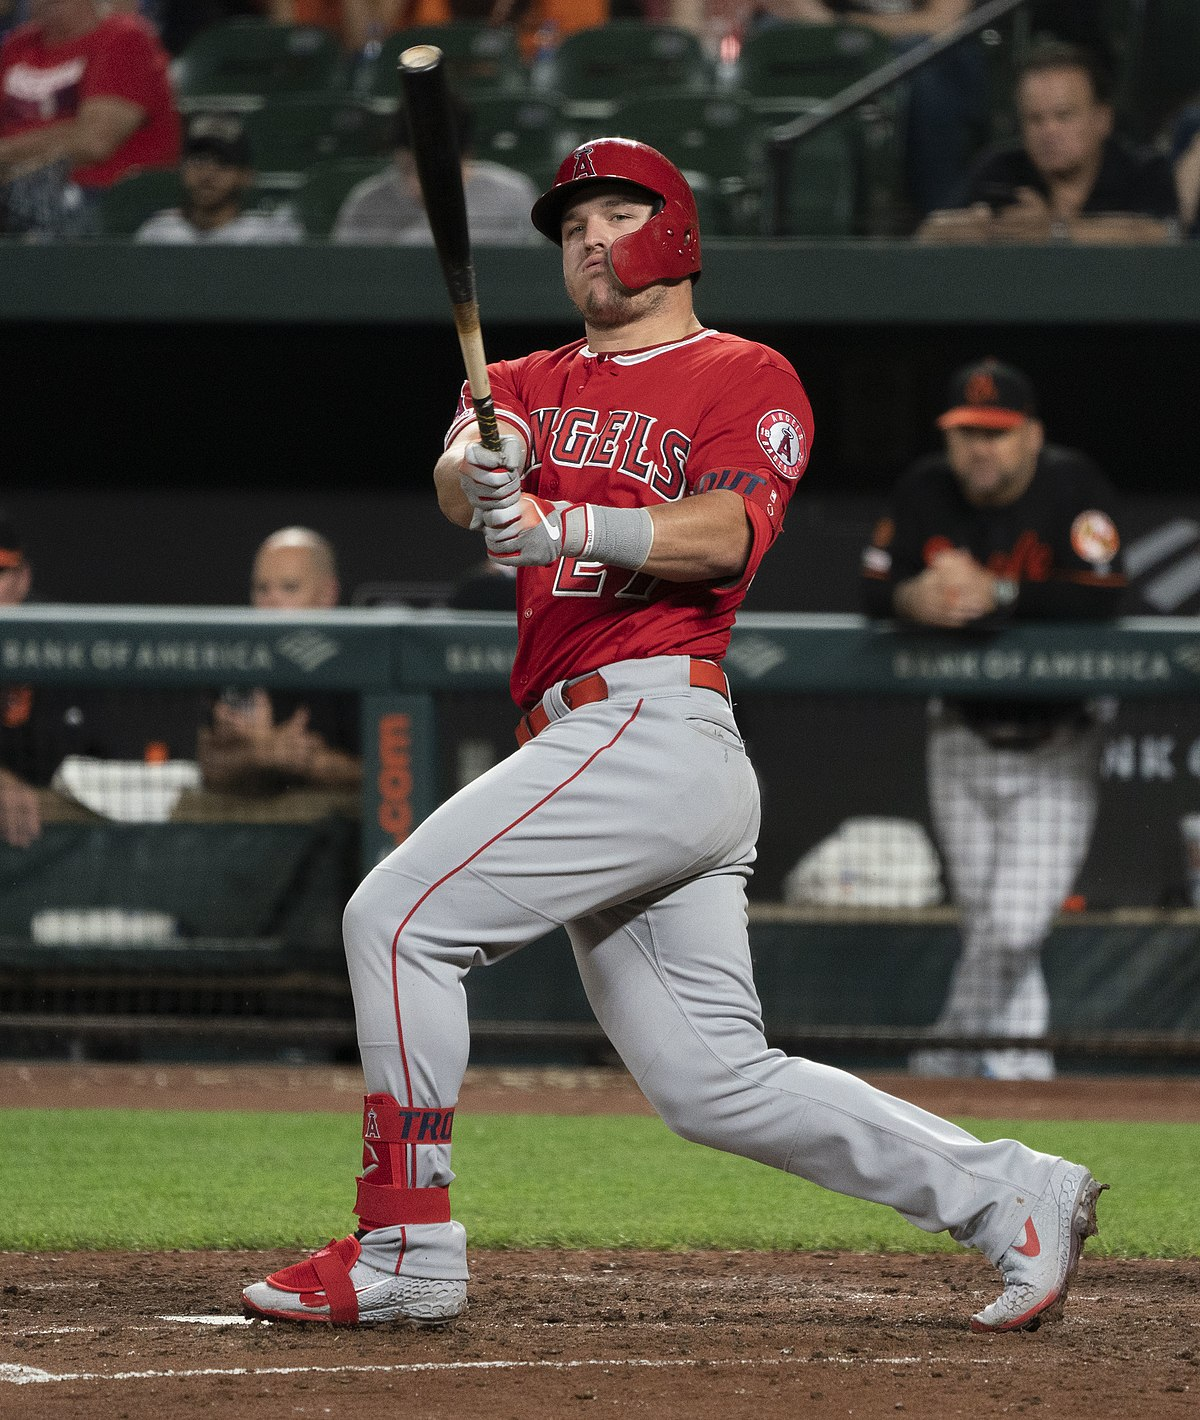 List of highest paid Major League Baseball players - Wikipedia